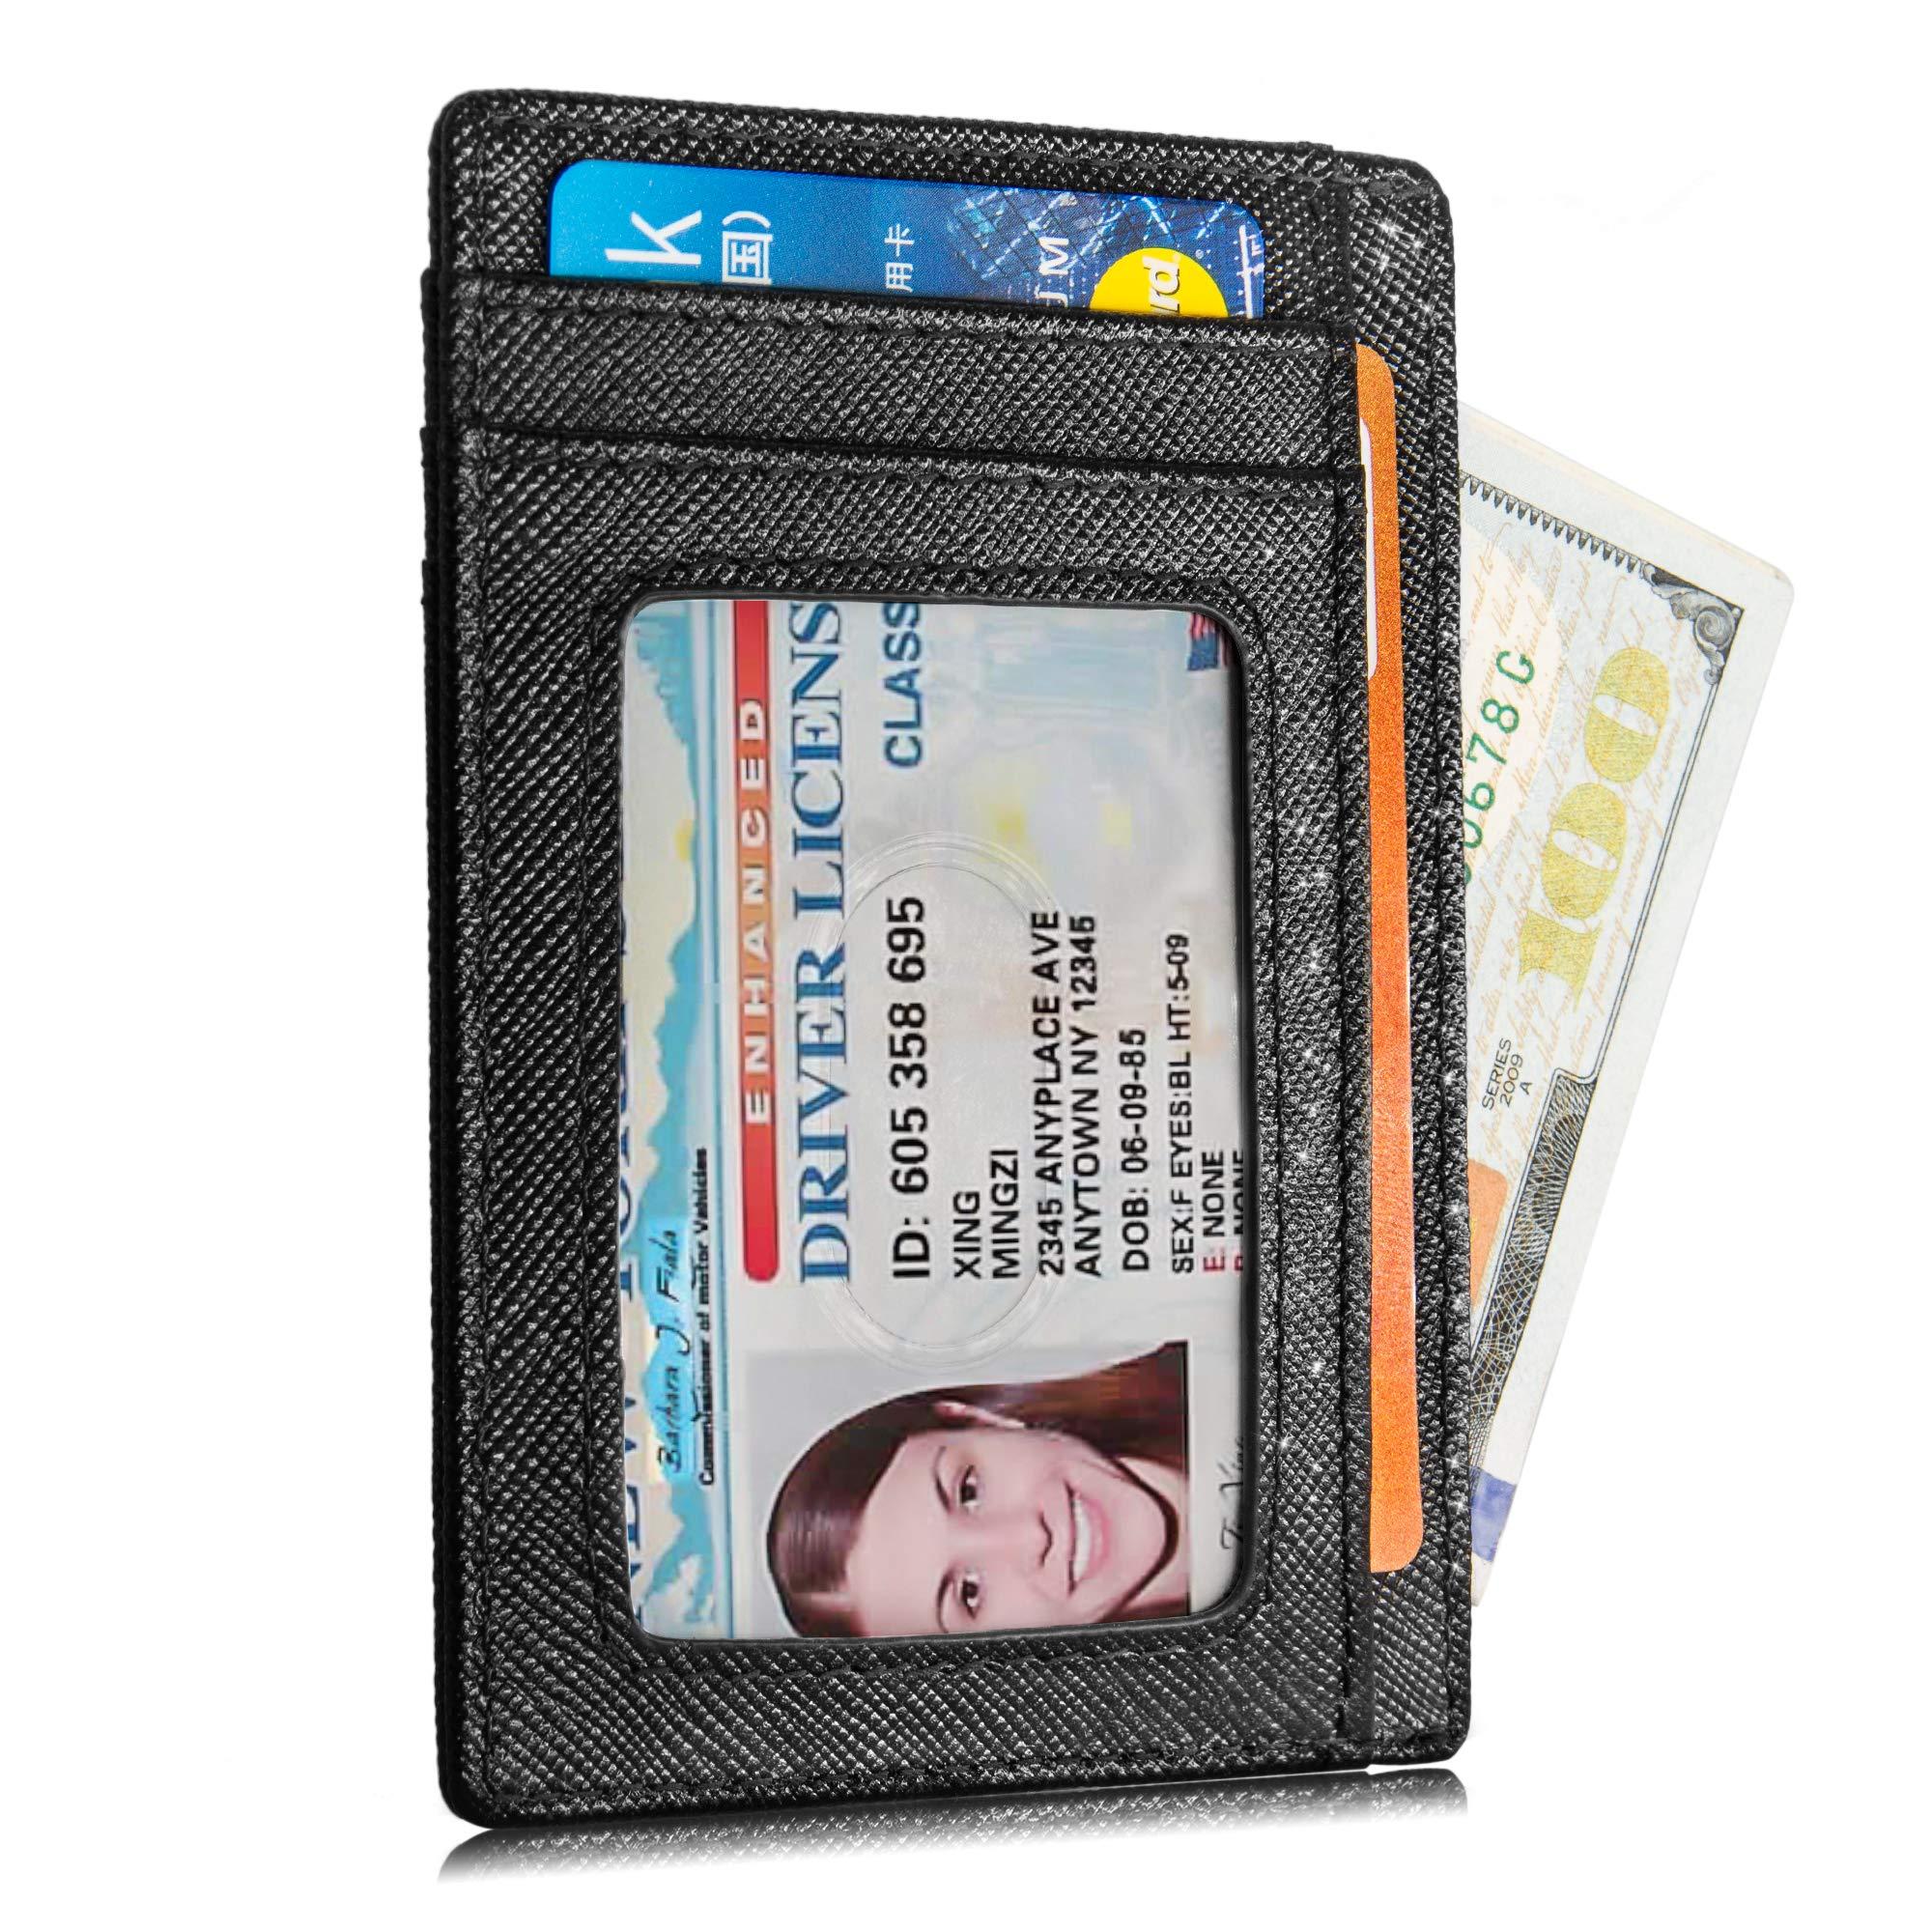 Hekate Slim Credit Card Holder Minimalist Genuine Leather RFID Blocking Wallet Front Pocket For Women